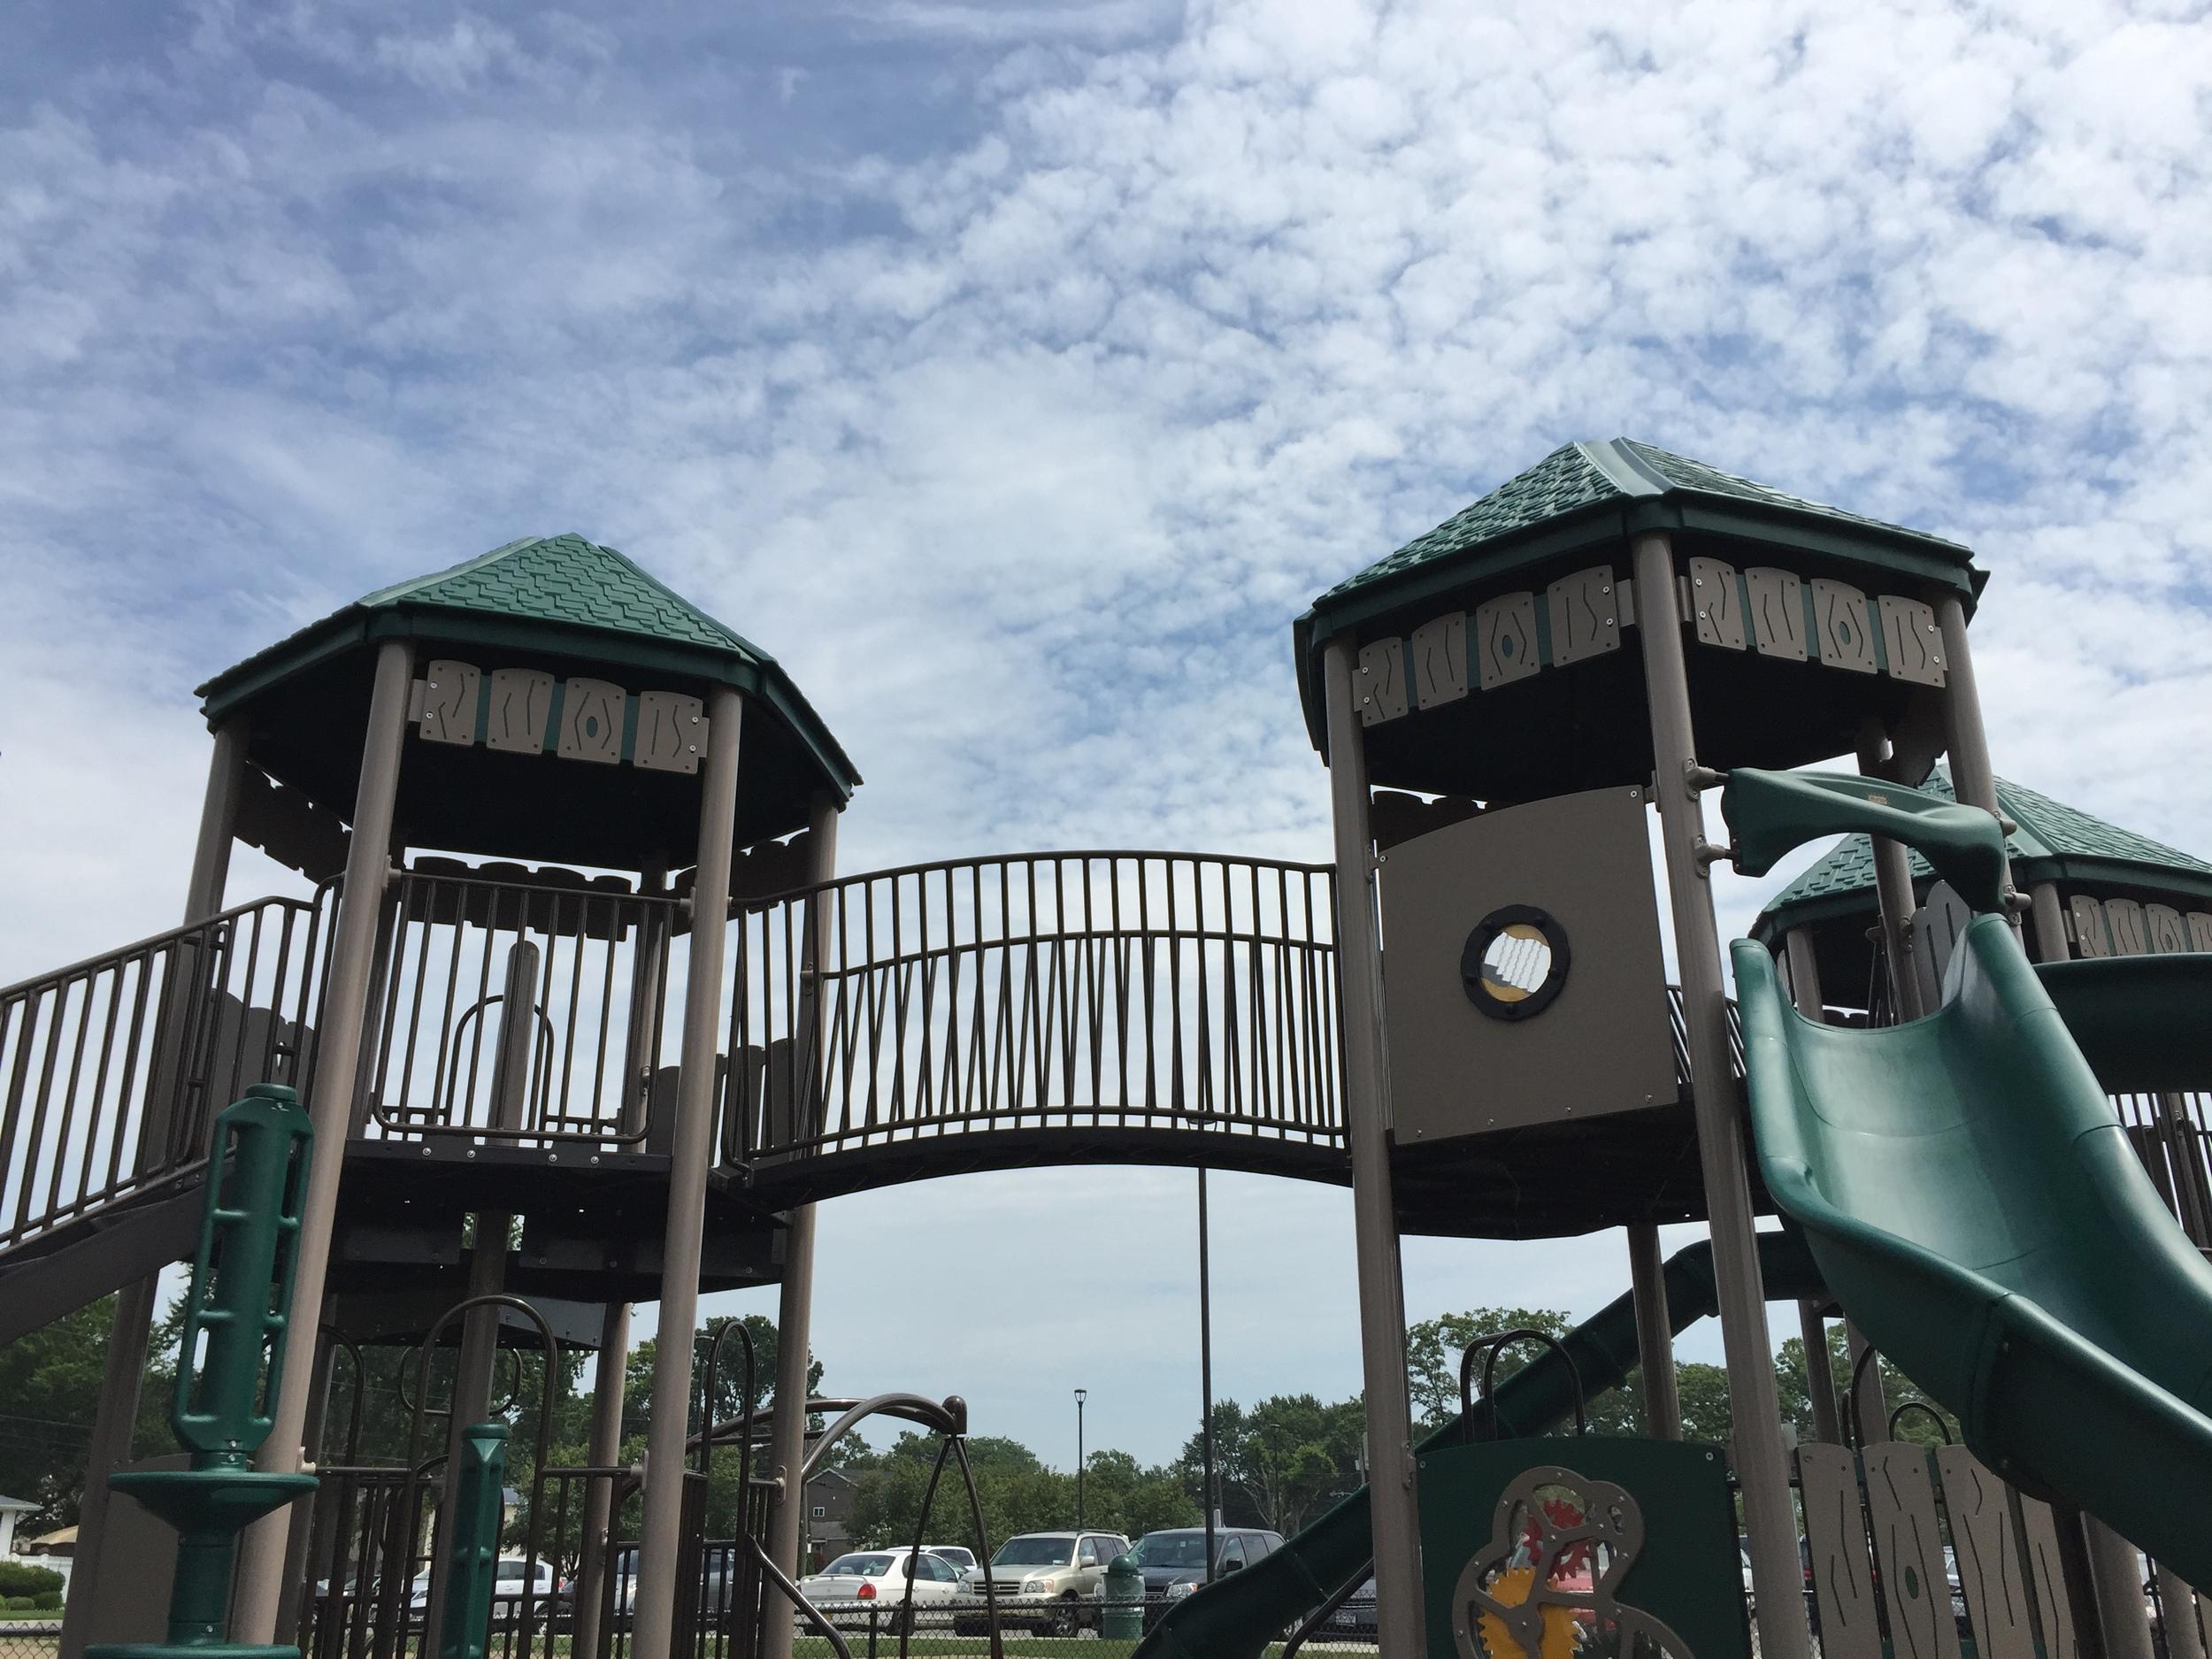 Playground at Geiger Memorial Park